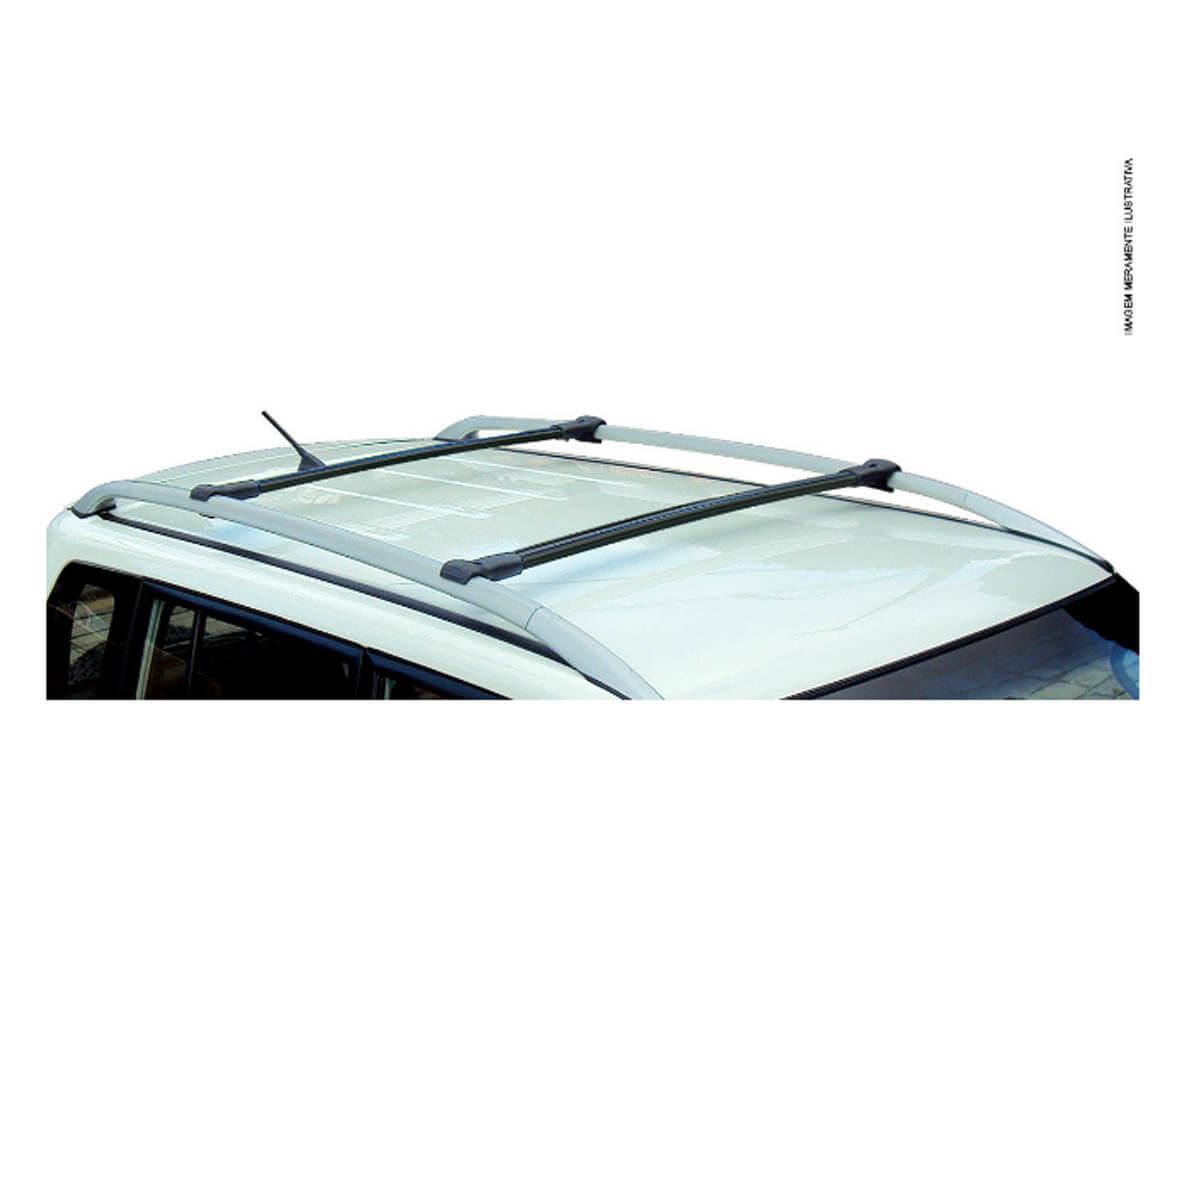 Travessa rack de teto larga preta alumínio Livina X-Gear 2010 a 2015